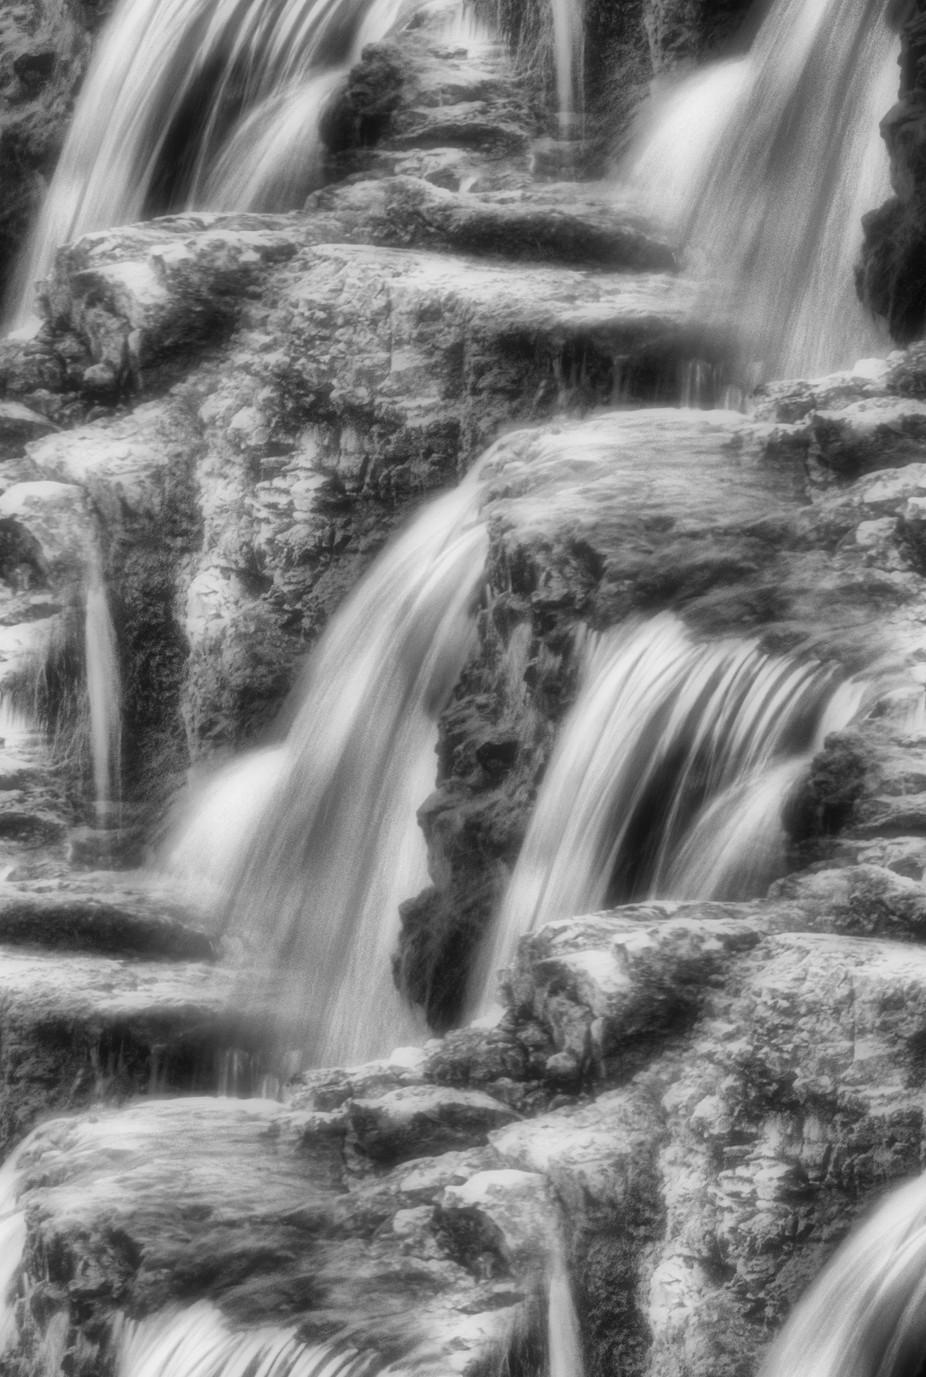 This is a creative view of Joplin Grand Falls in Joplin, MO.